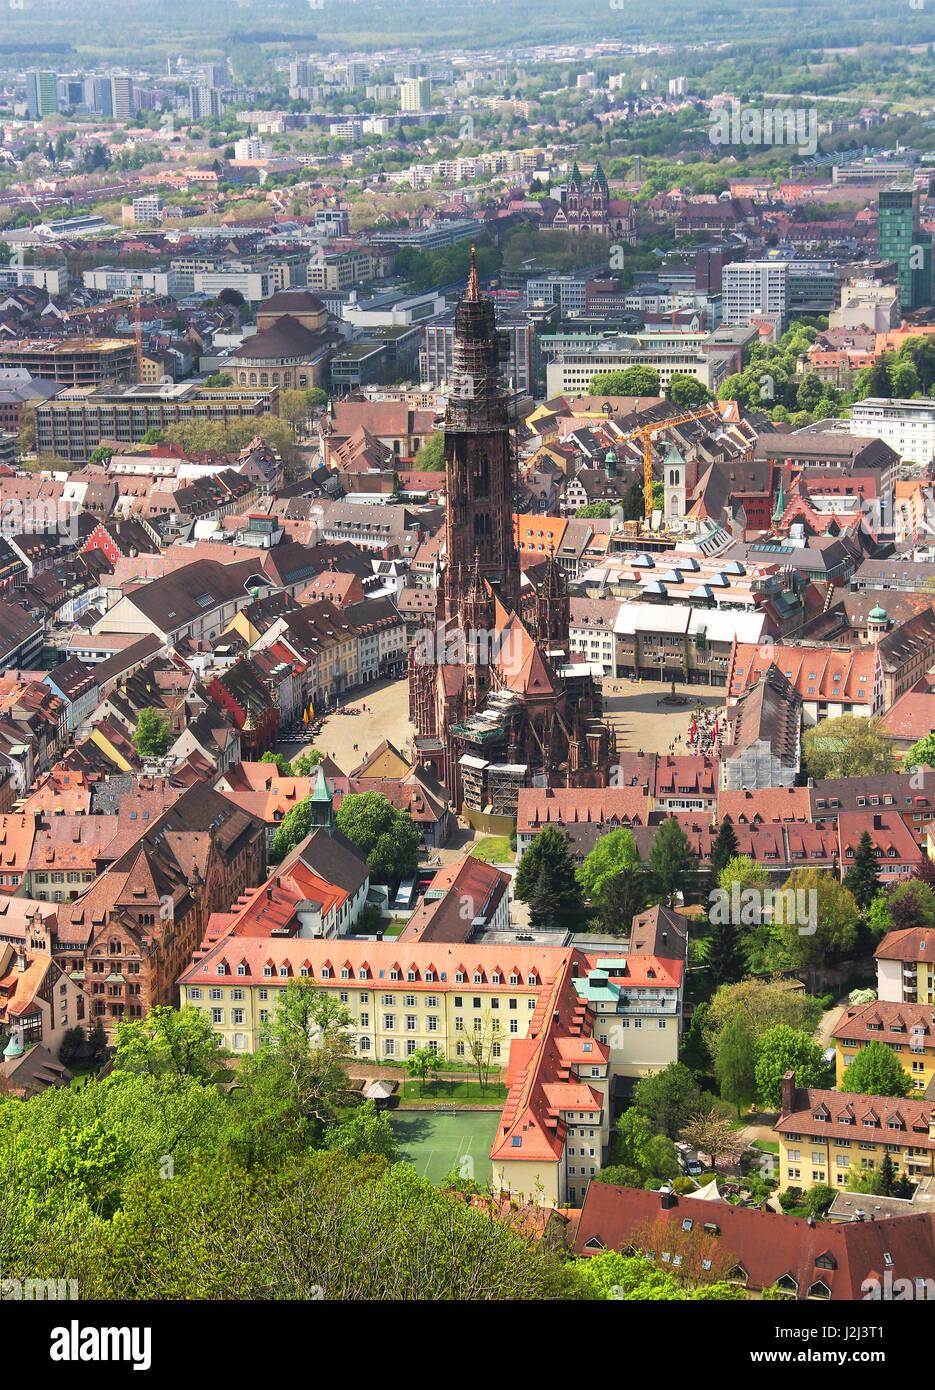 Munster and old town of Freiburg im Breisgau, Baden-Wurttemberg, Germany Stock Photo